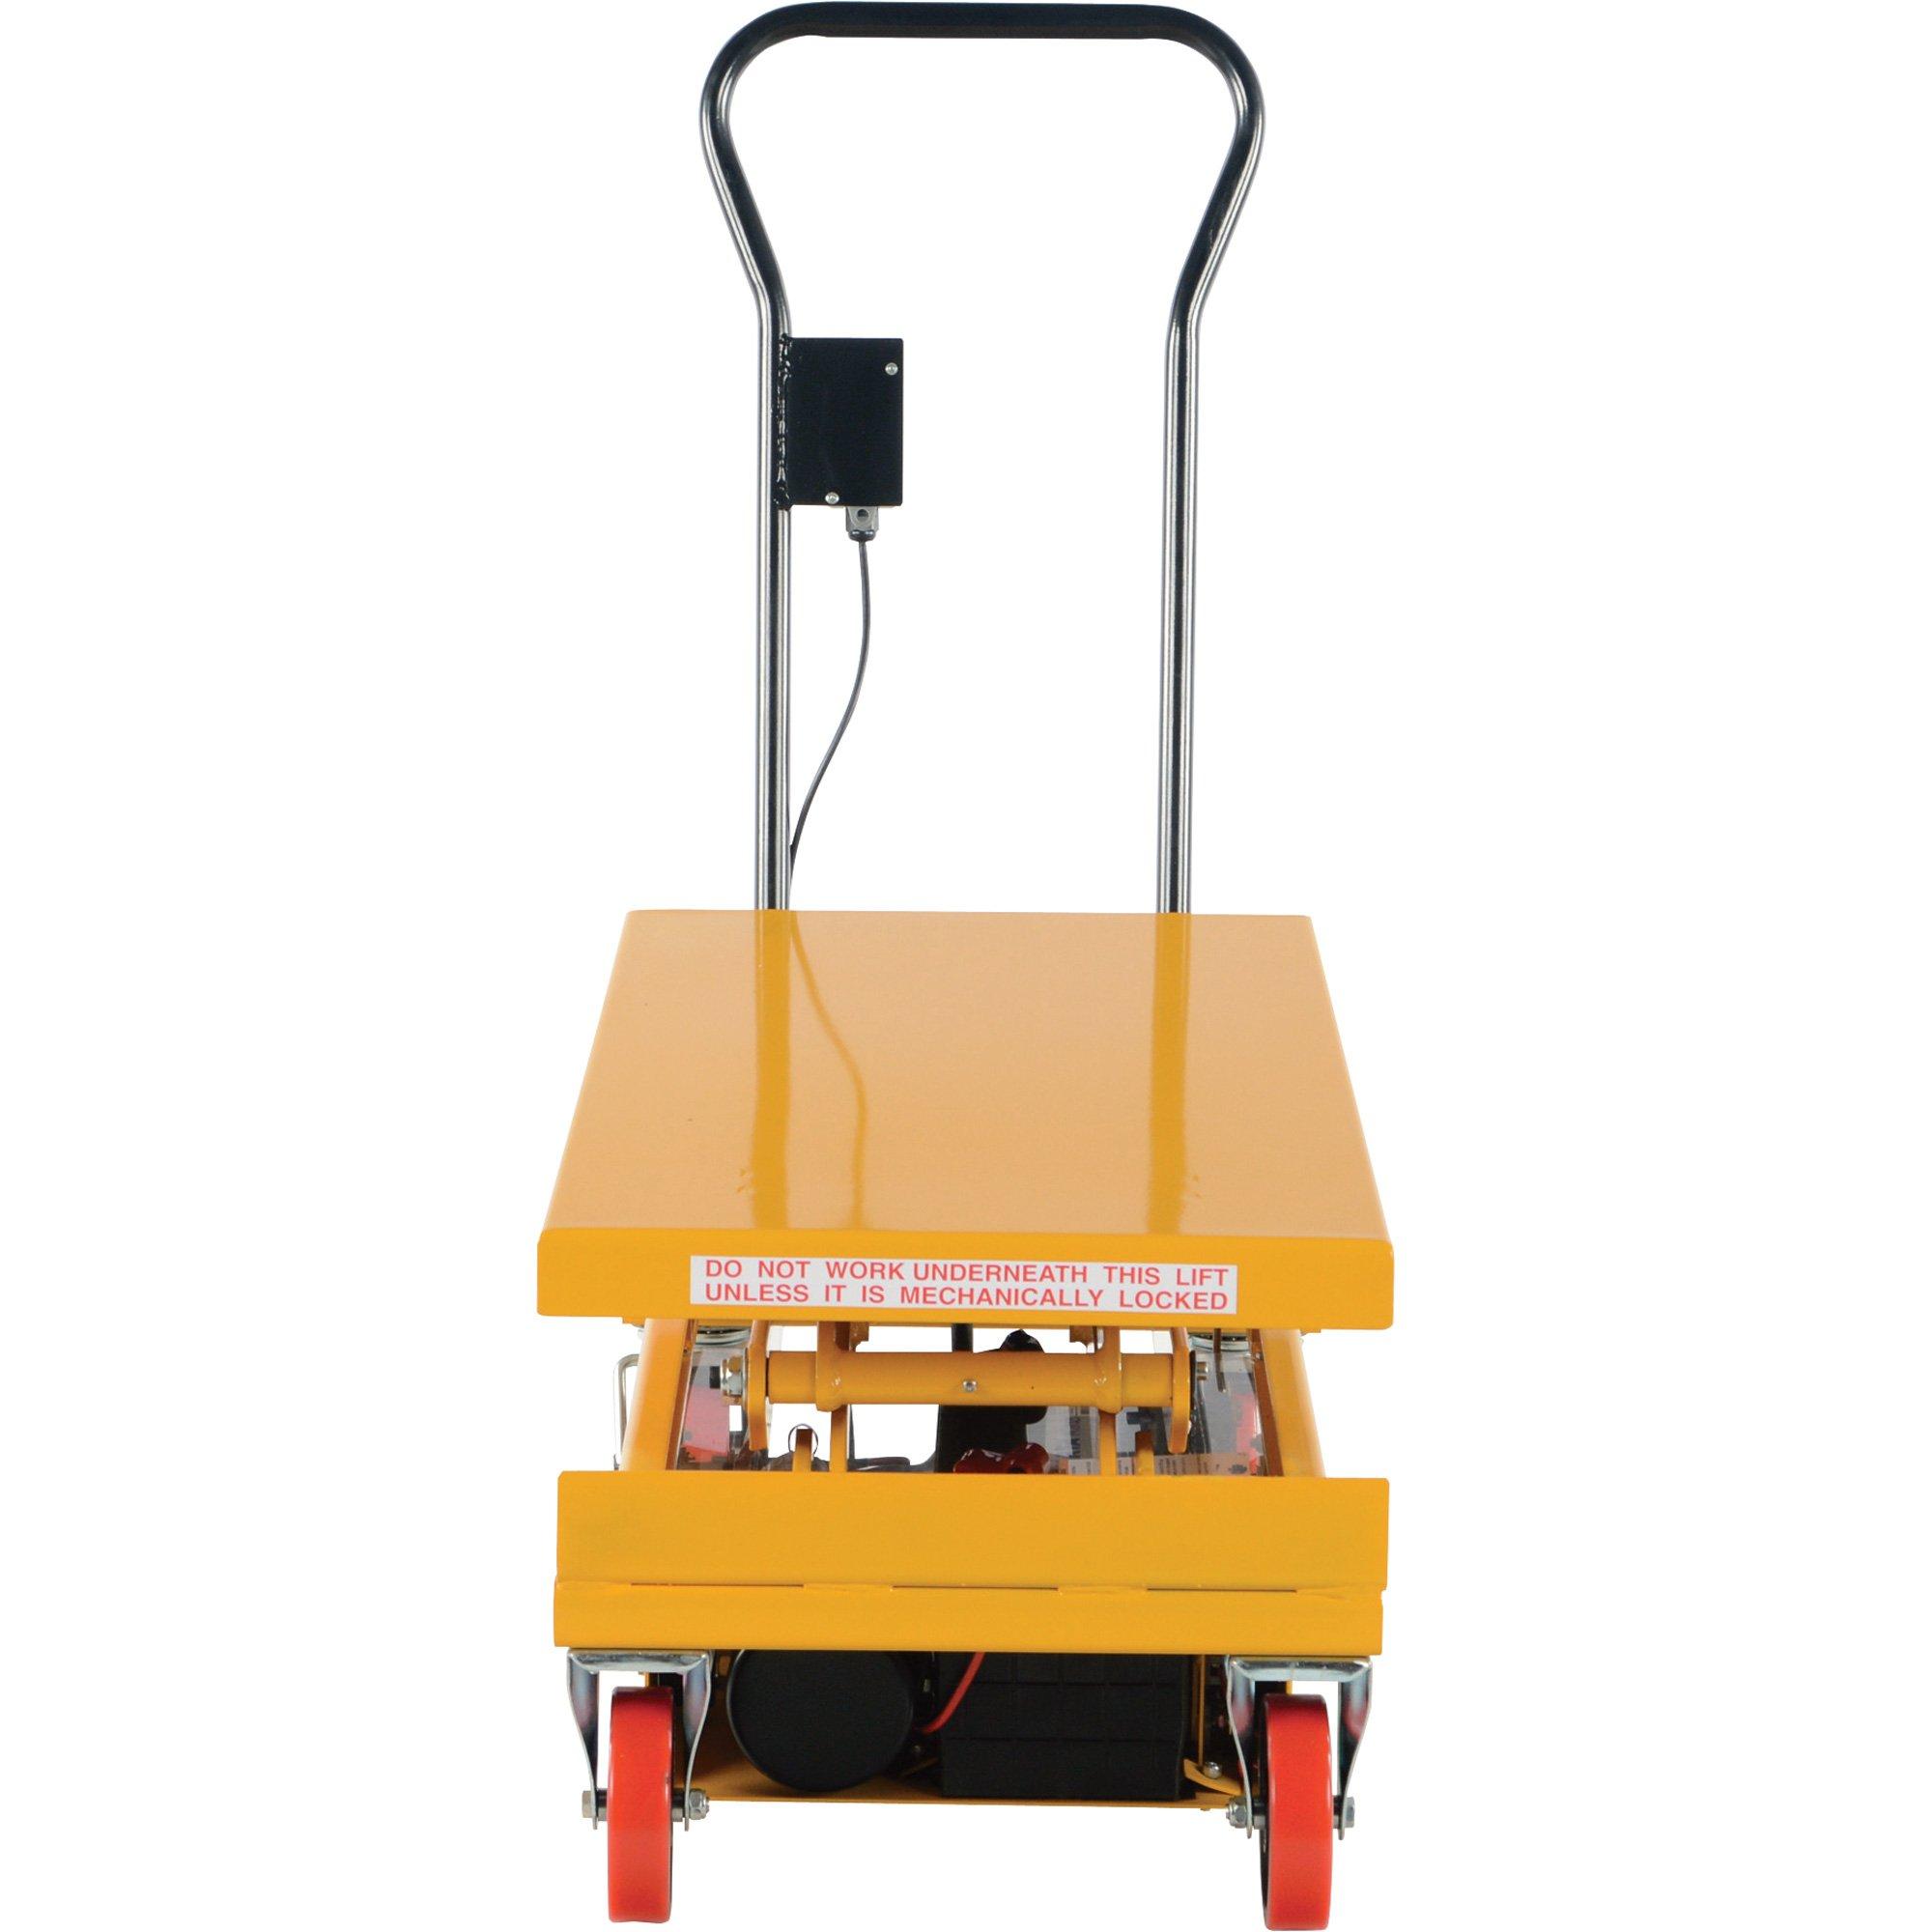 Vestil CART-1000D-DC Steel Double Scissor Cart, Hydraulic, 12V, 1000 lb. Capacity, 40'' x 24'' Platform, Height Range 19-1/2'' to 63-3/4'', Yellow